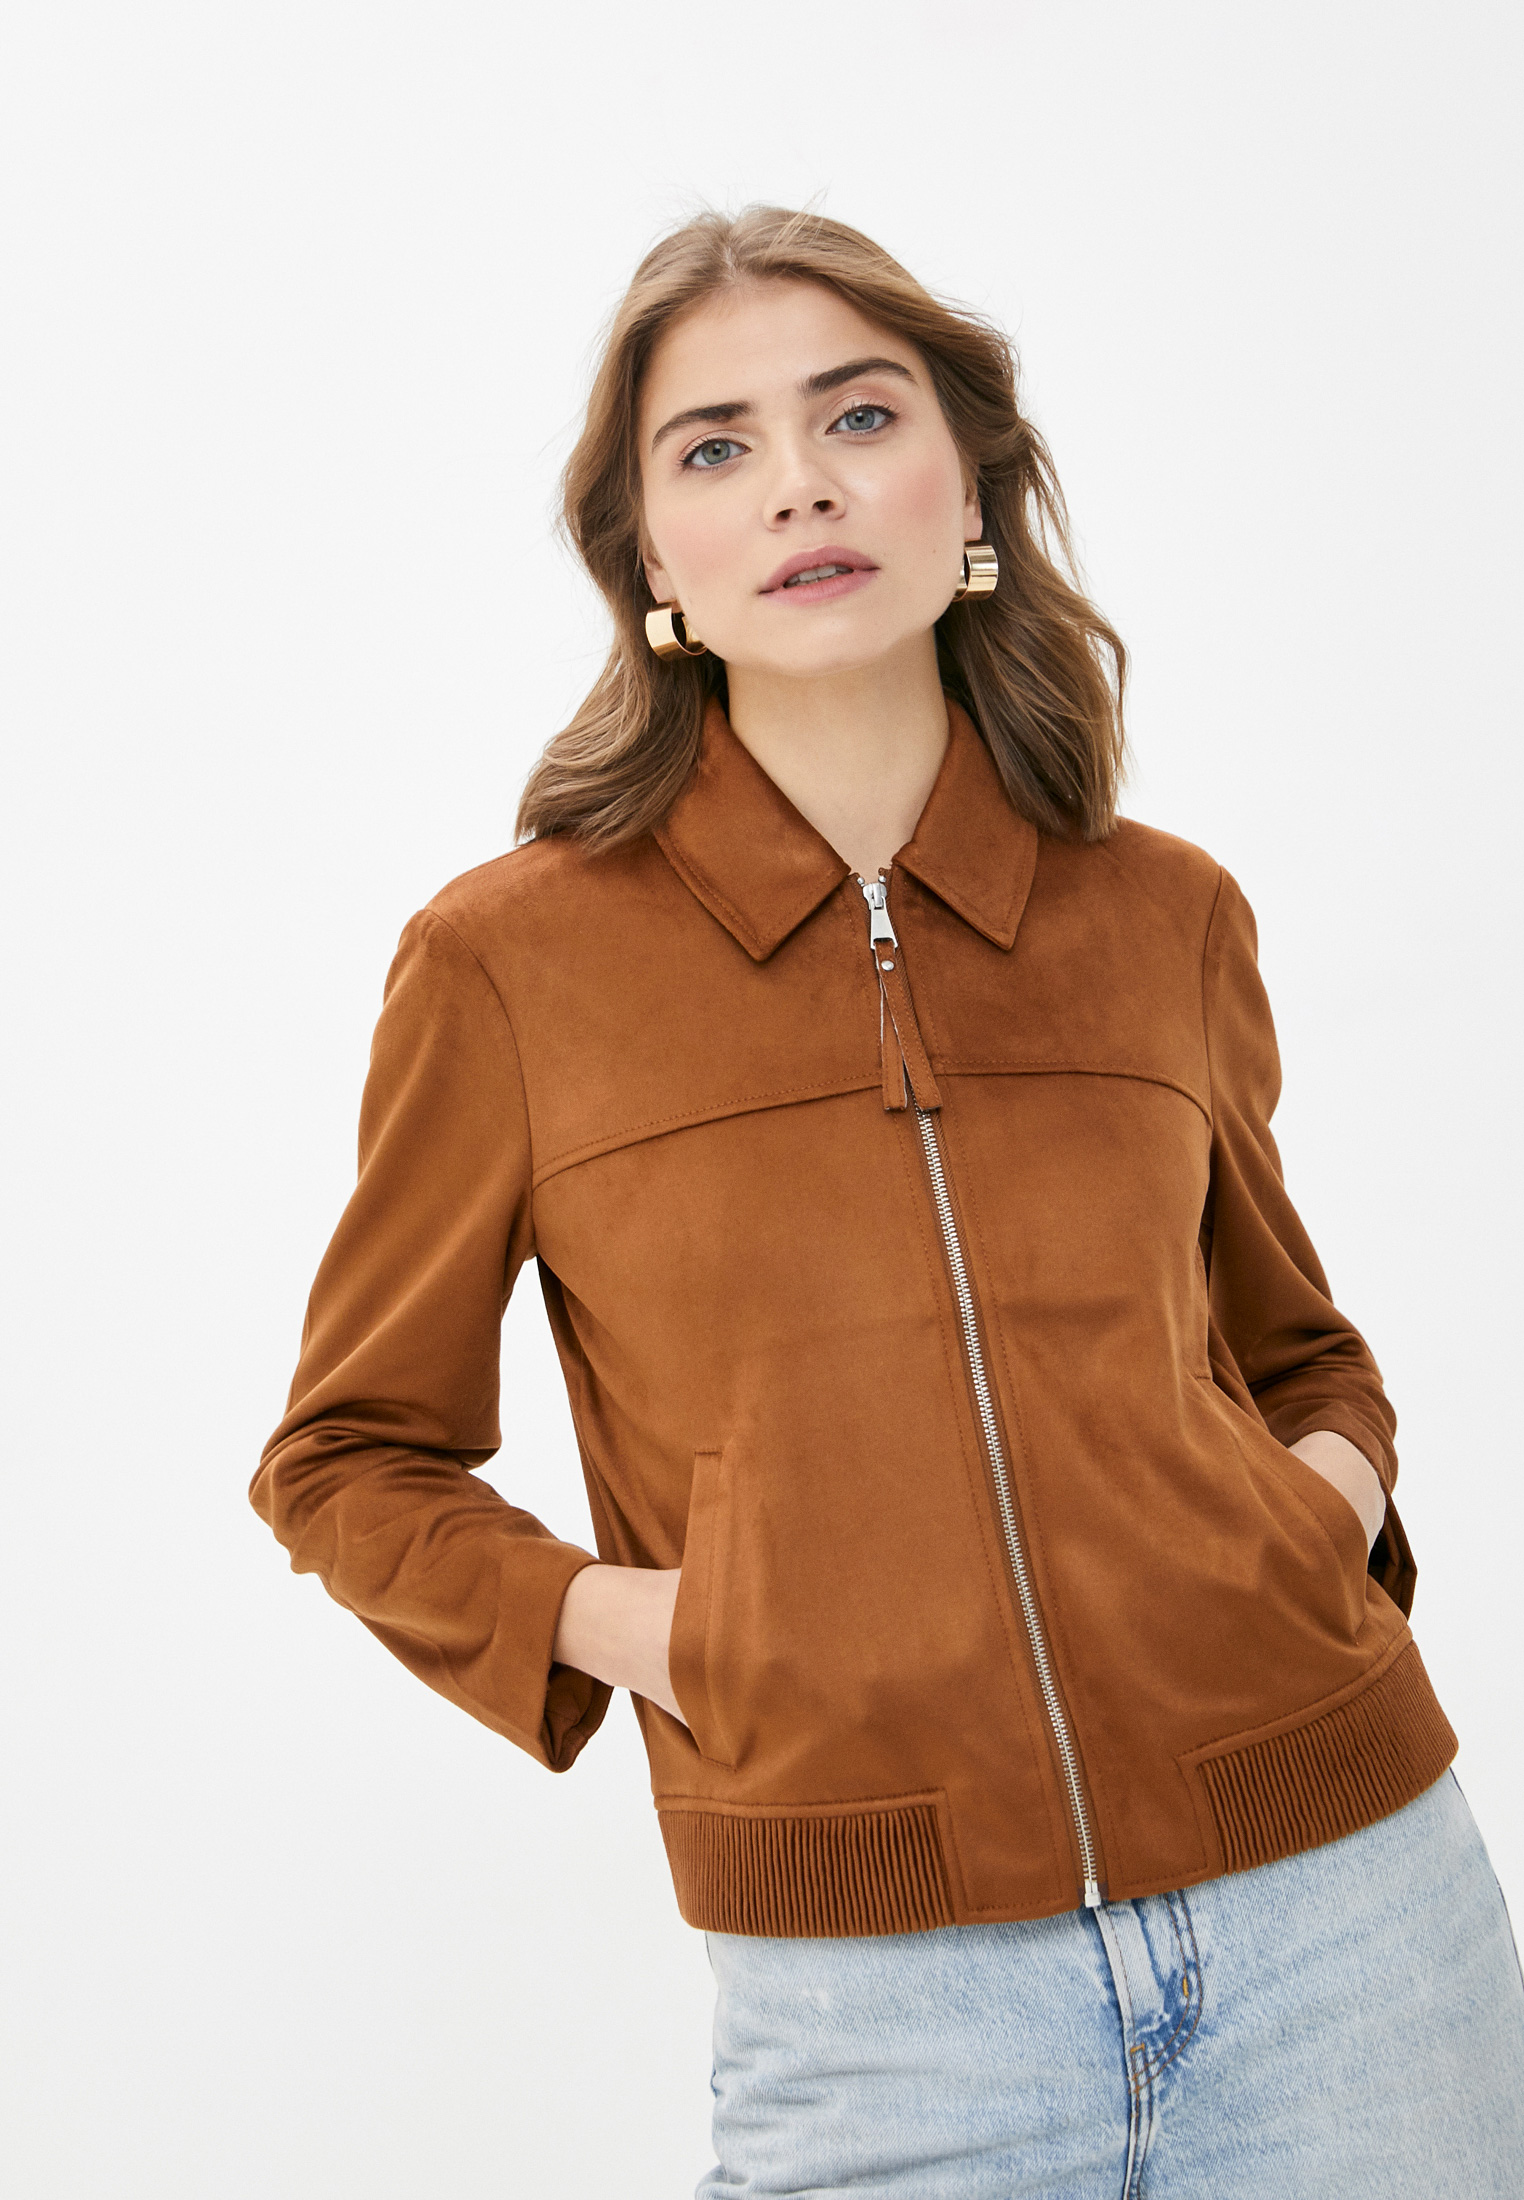 Кожаная куртка s.Oliver (с.Оливер) Куртка кожаная s.Oliver